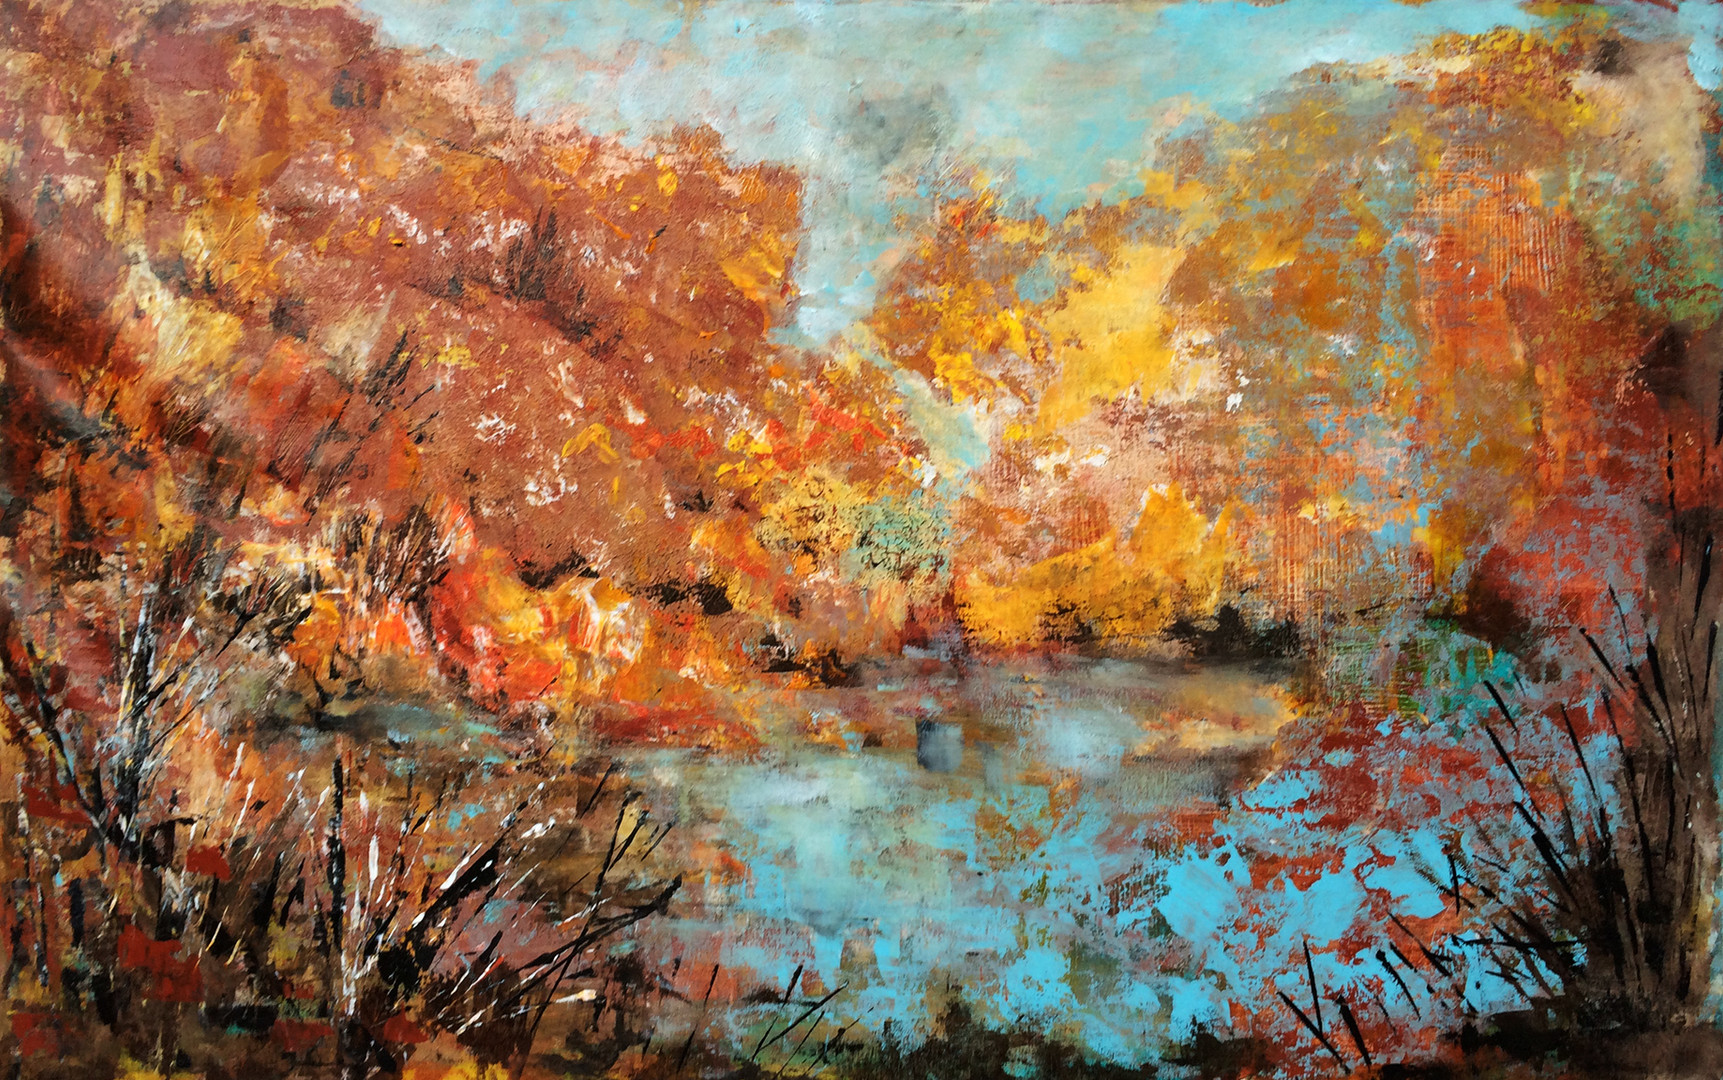 "Autumn,acrylic on canvas, 30x46"", SOLD"